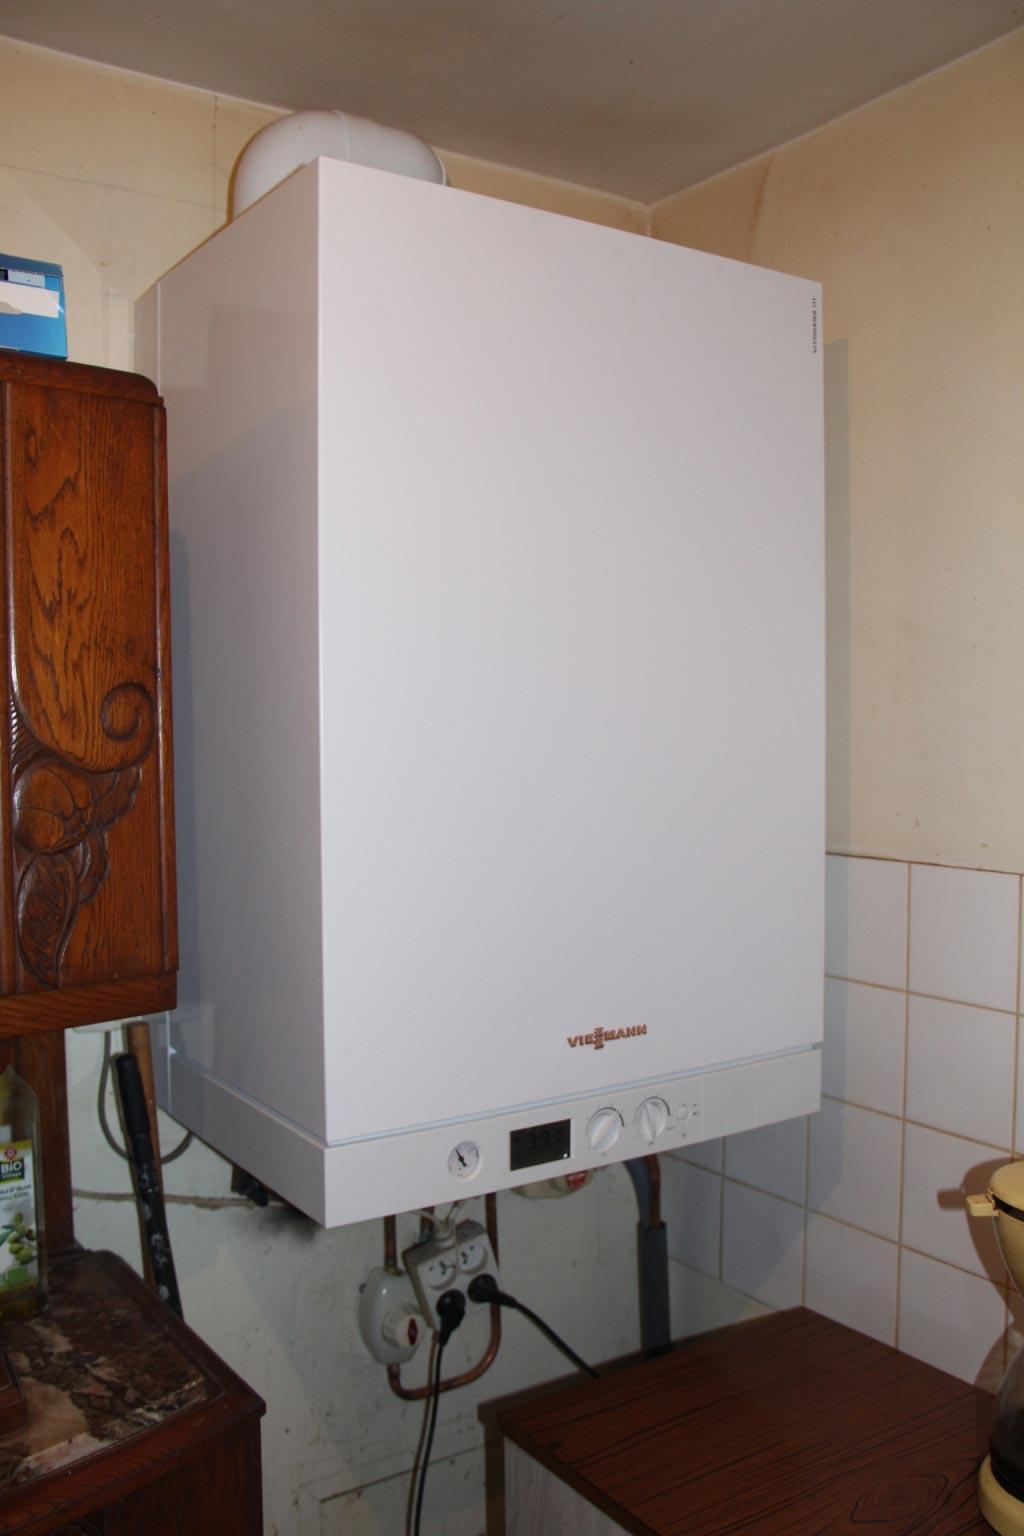 Installation d'une chaudière gaz à condensation Viessmann